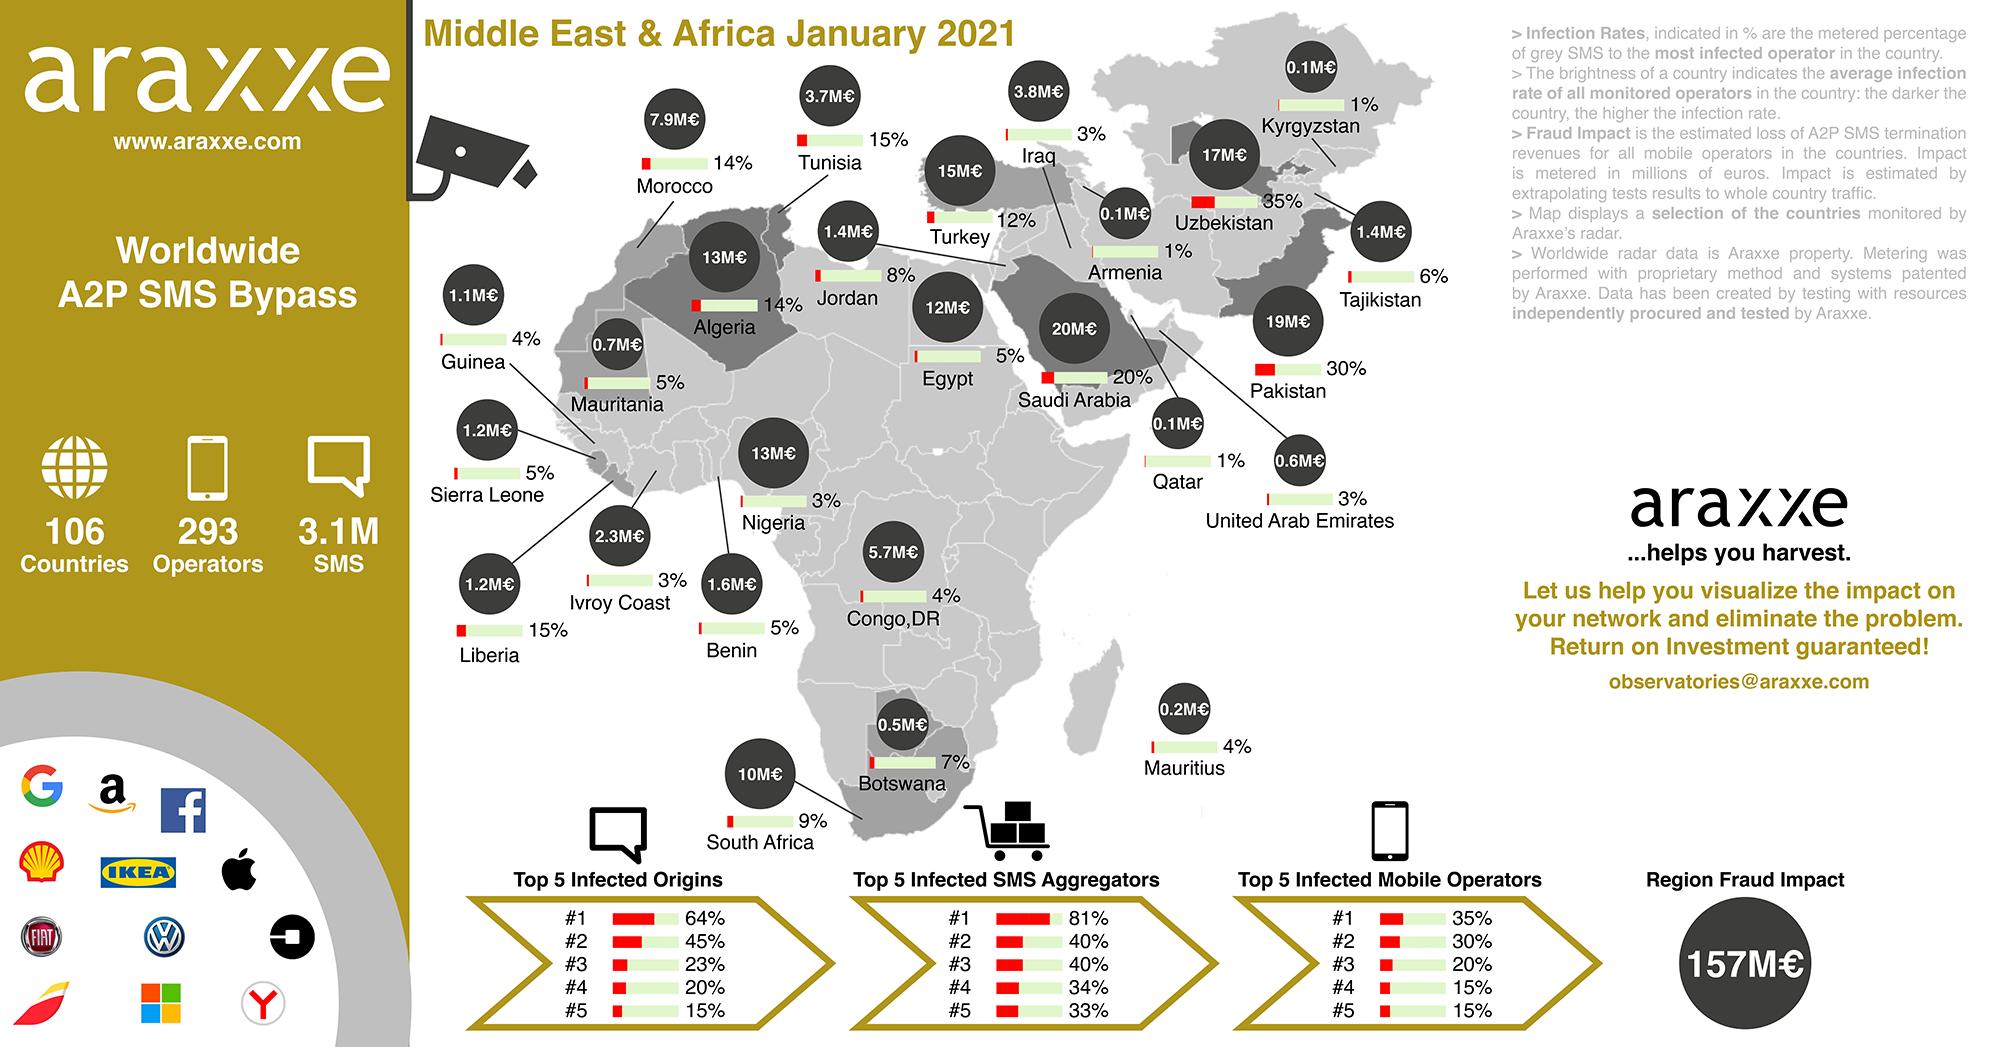 Business Message Observatory_MiddleEastAfrica_January2021